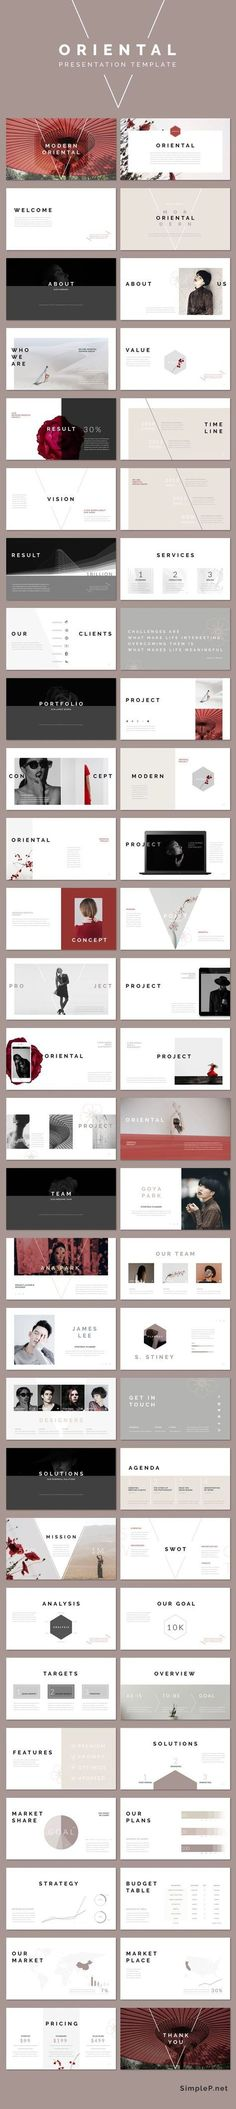 Modern Stylish Keynote Presentation Template #ppttemplate #oriental #portfolio #business #marketing #proposal